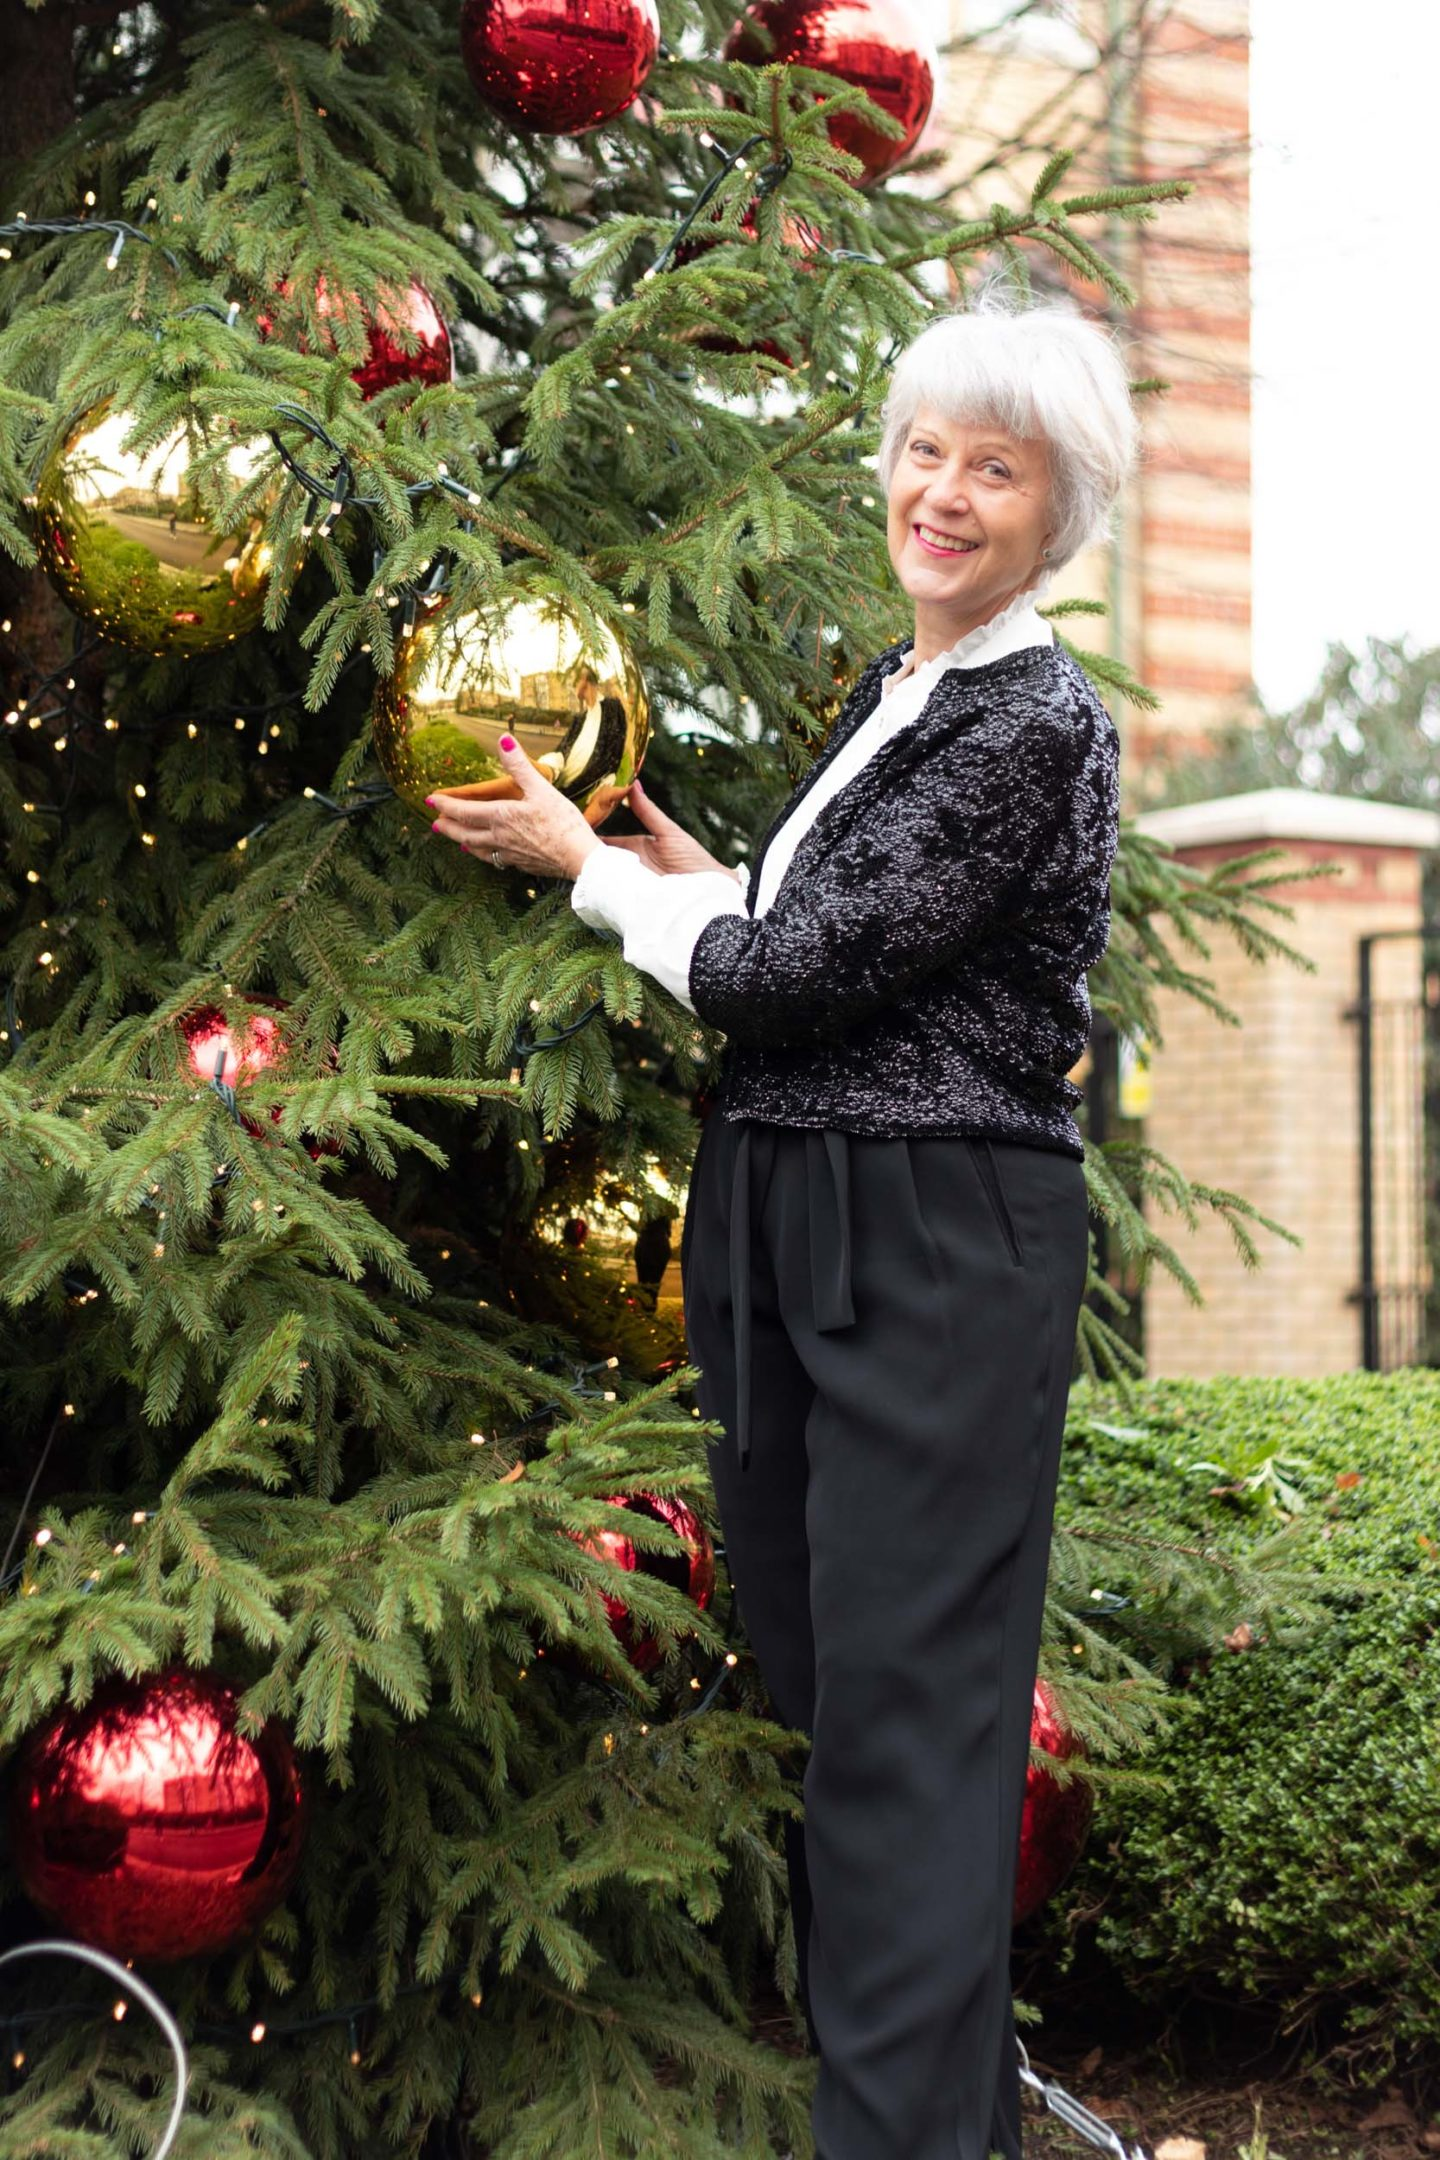 Wishing you a sparkly and joyous festive season